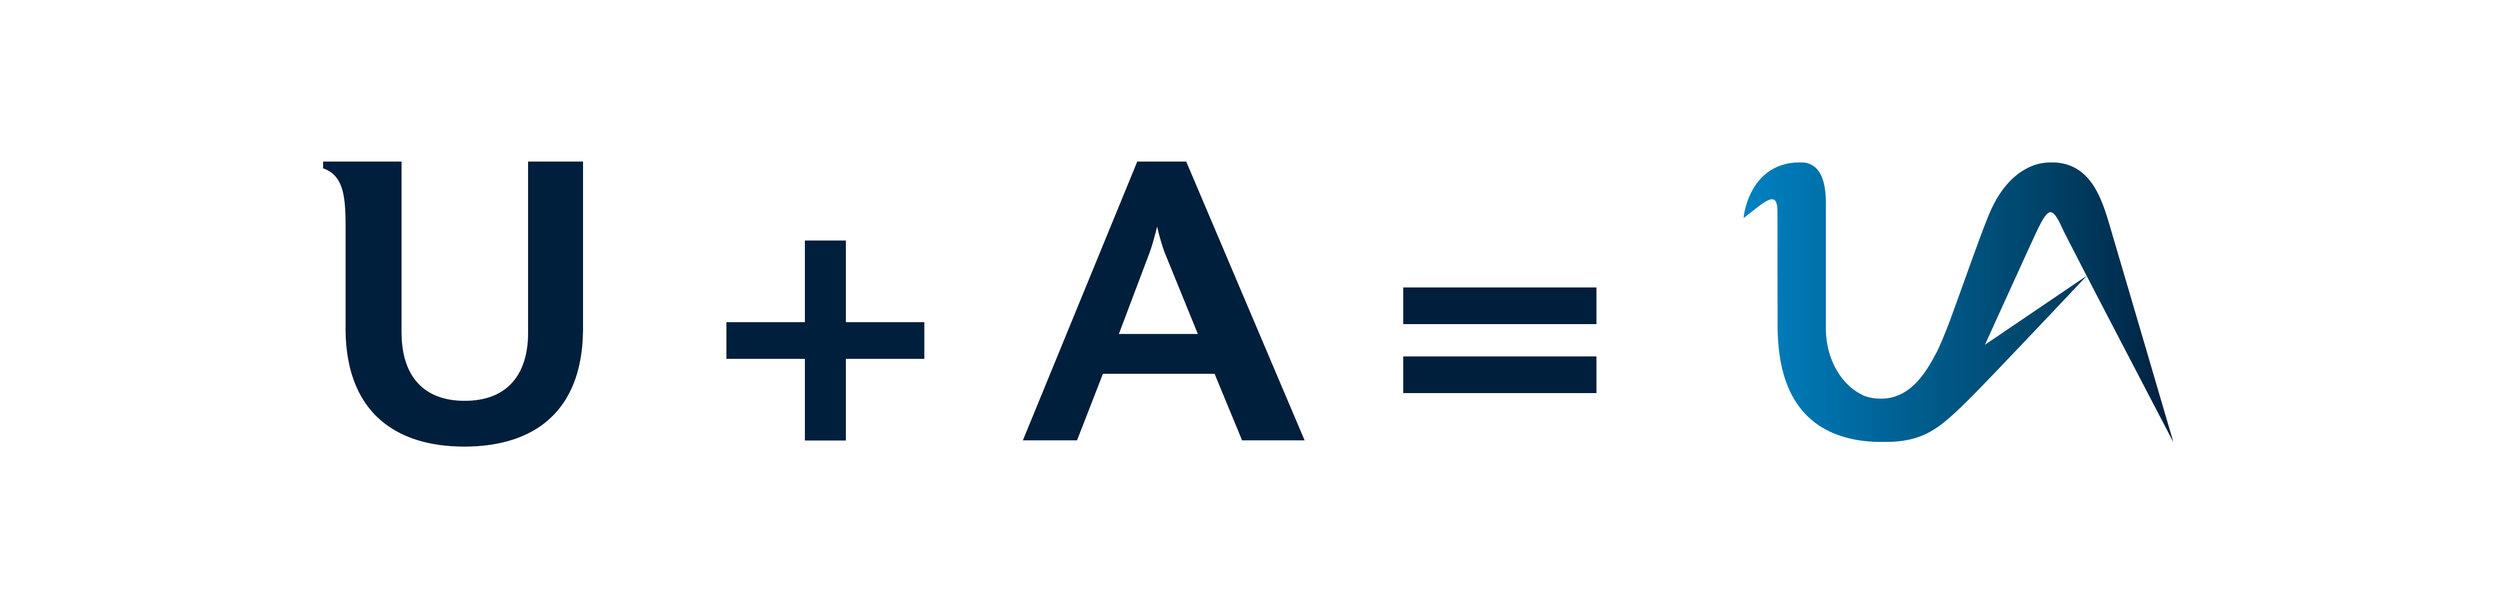 university avenue logo formation